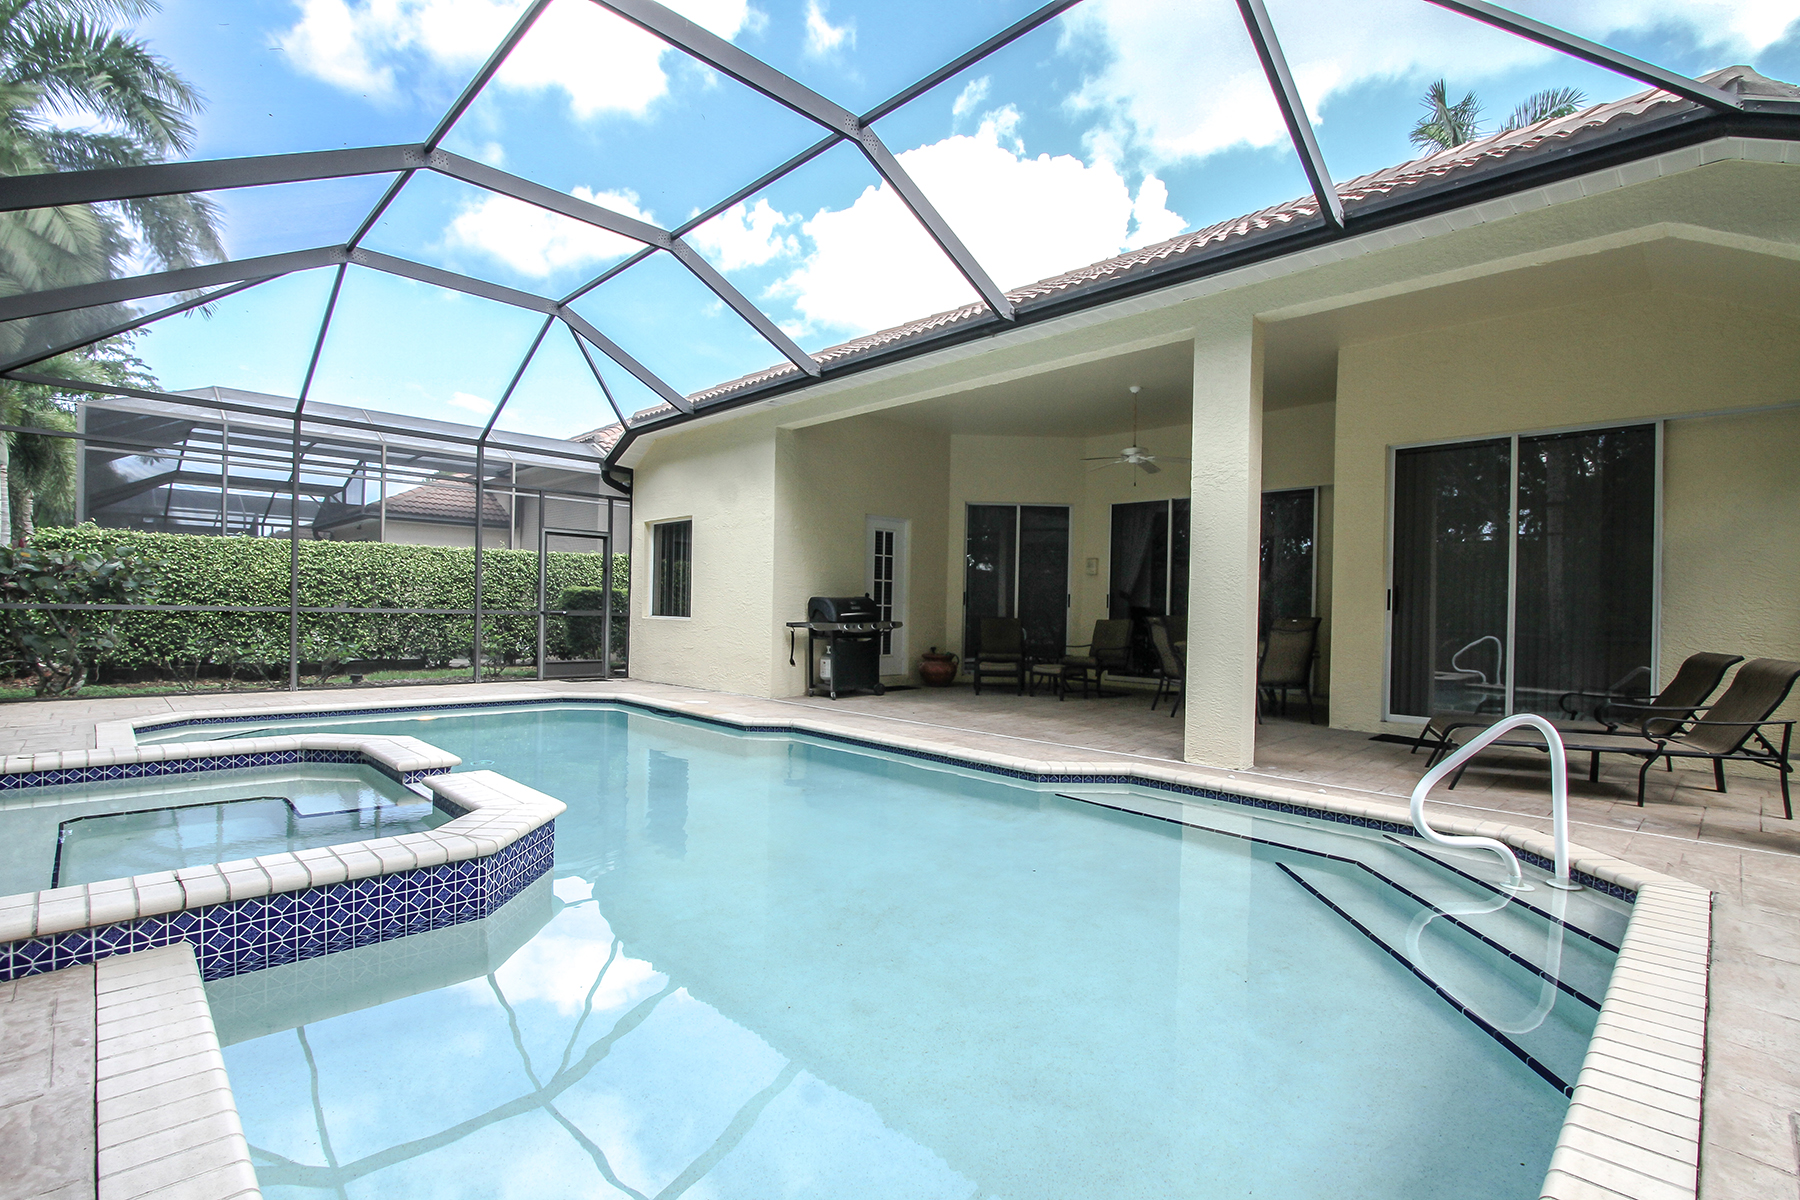 Single Family Home for Rent at PELICAN MARSH - VENTURA 8844 Ventura Way, Naples, Florida 34109 United States